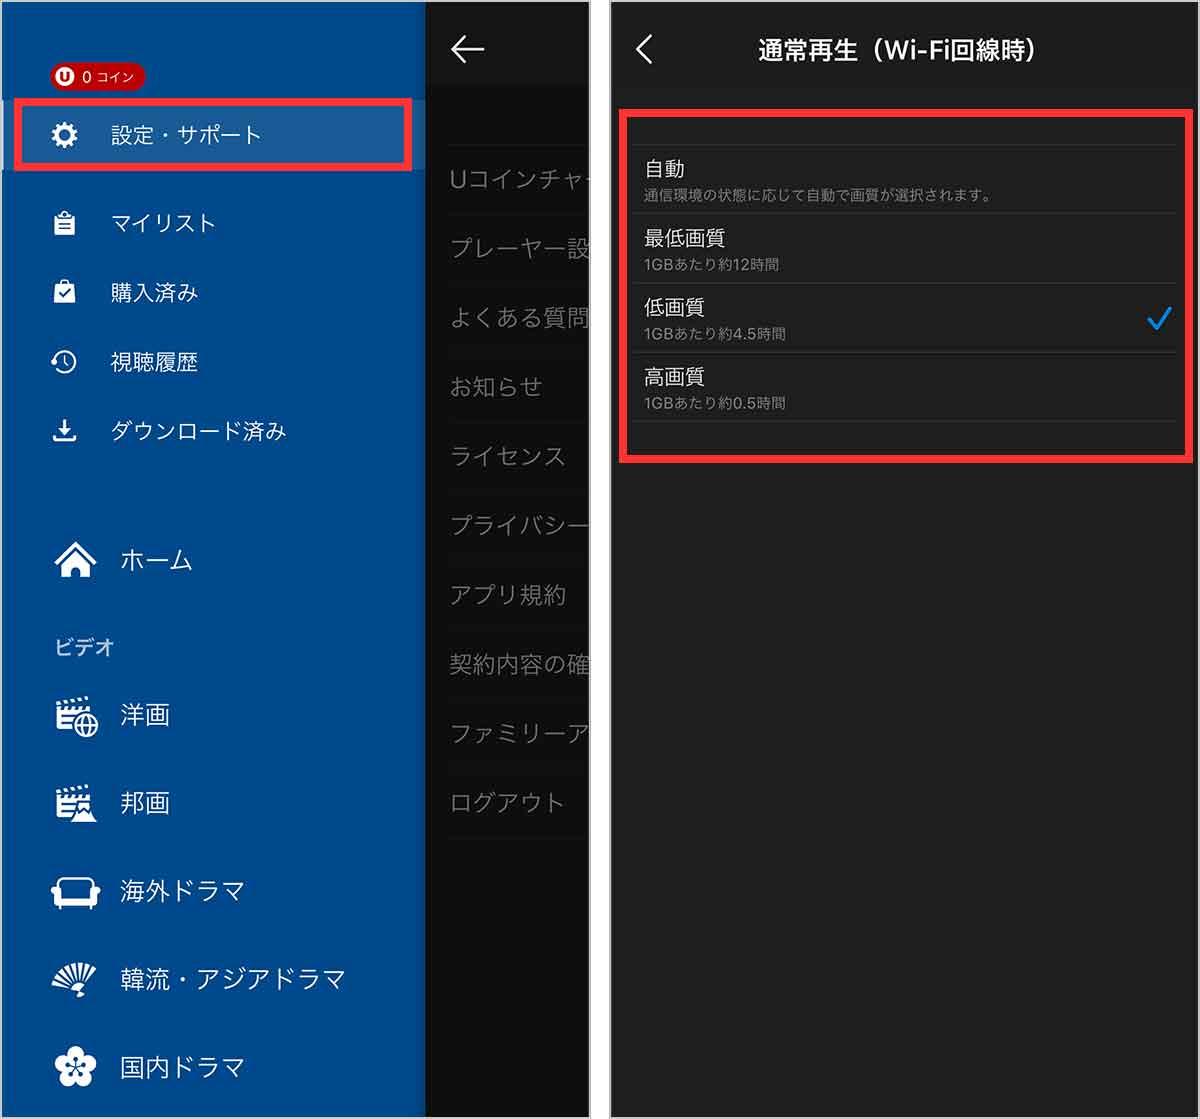 U-NEXTスマホアプリの低画質設定